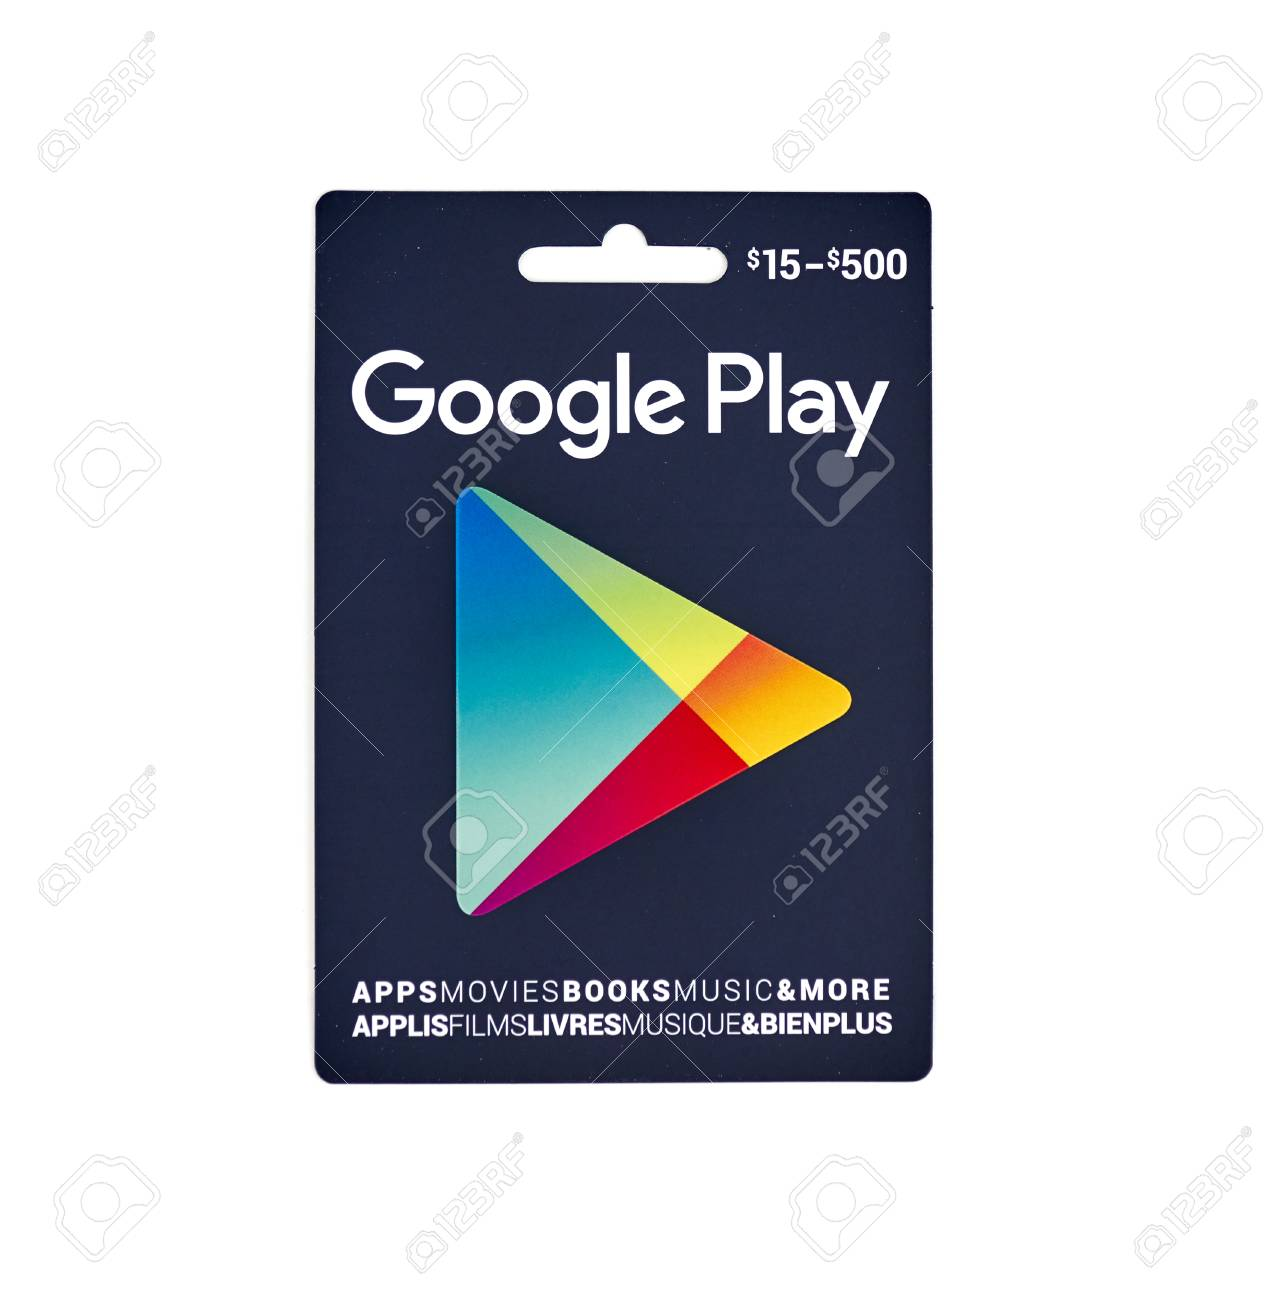 Montreal Canada 10 De Marzo De 2017 Giftcard Popular De Google